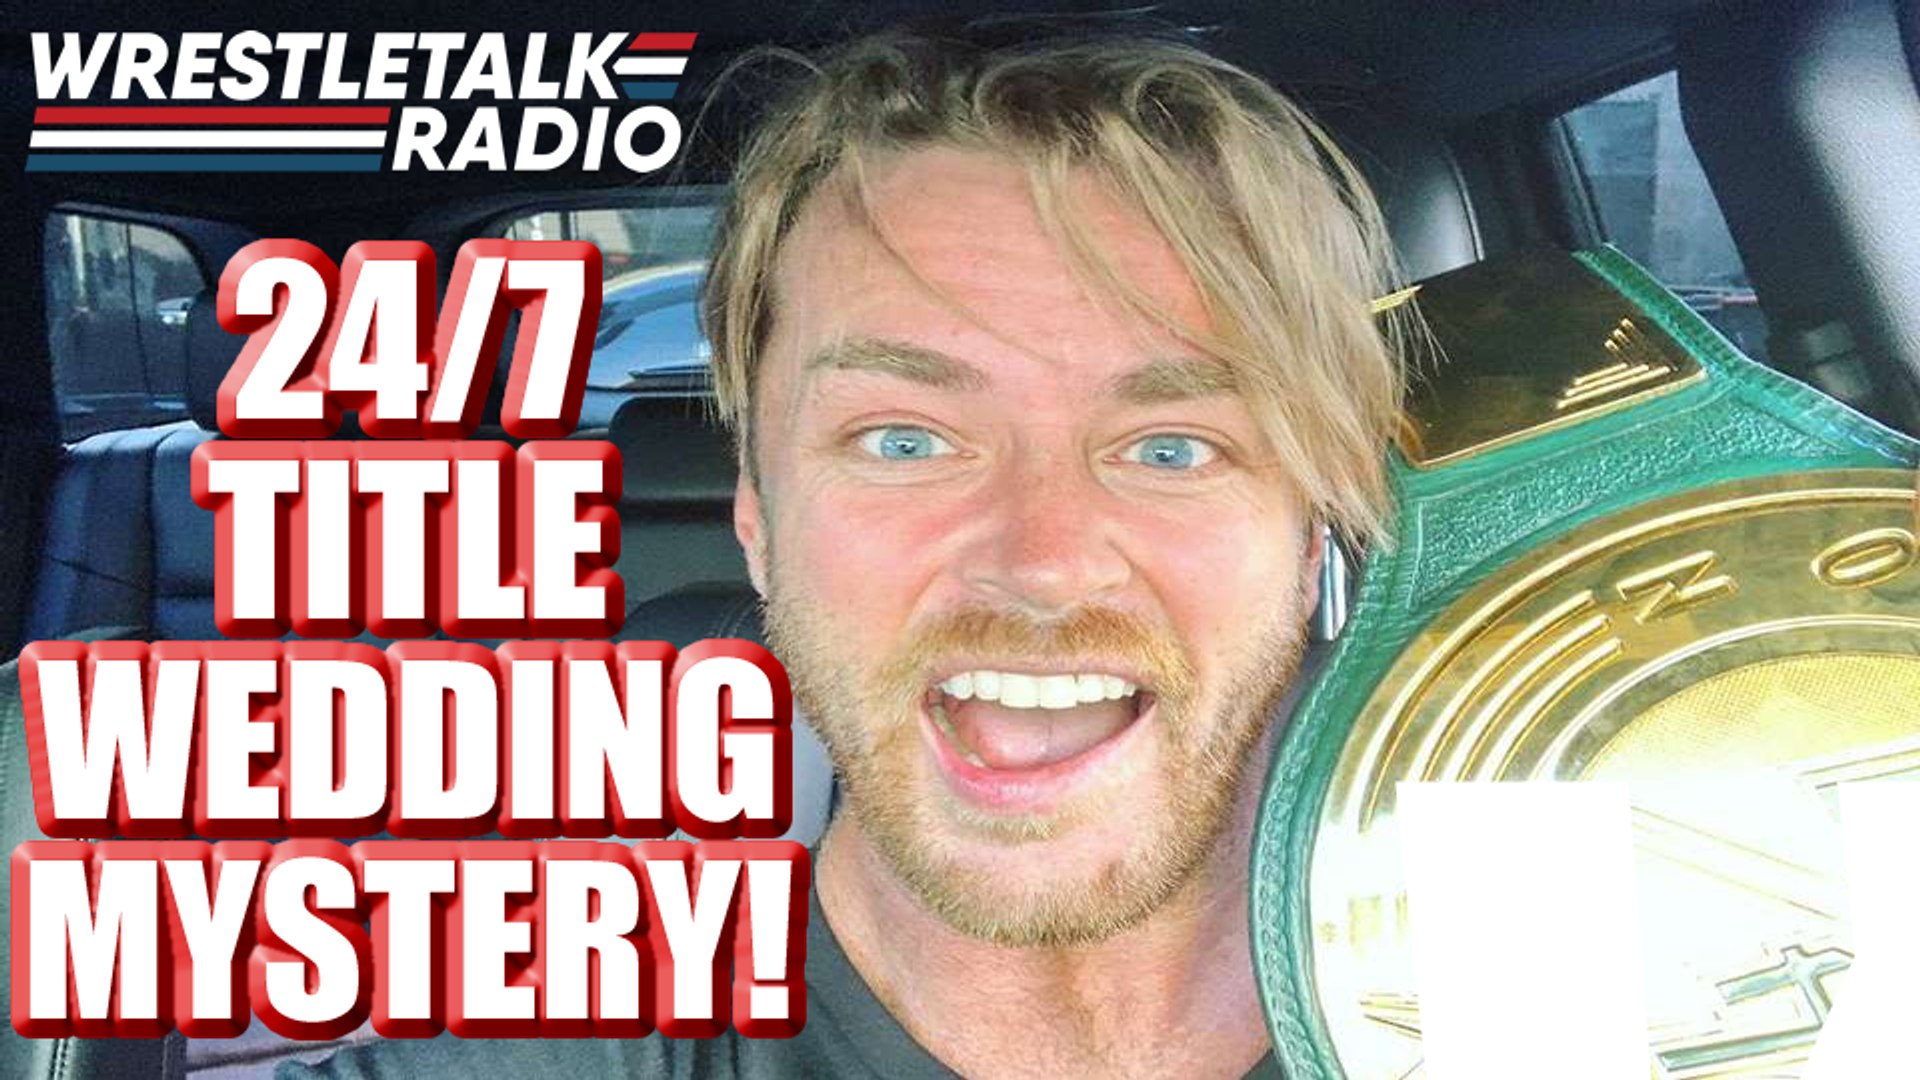 WWE 24/7 Title Wedding SHOCKER!! WWE Superstar Undergoes SURGERY!! WWE Stomping Grounds PREDICTIONS!